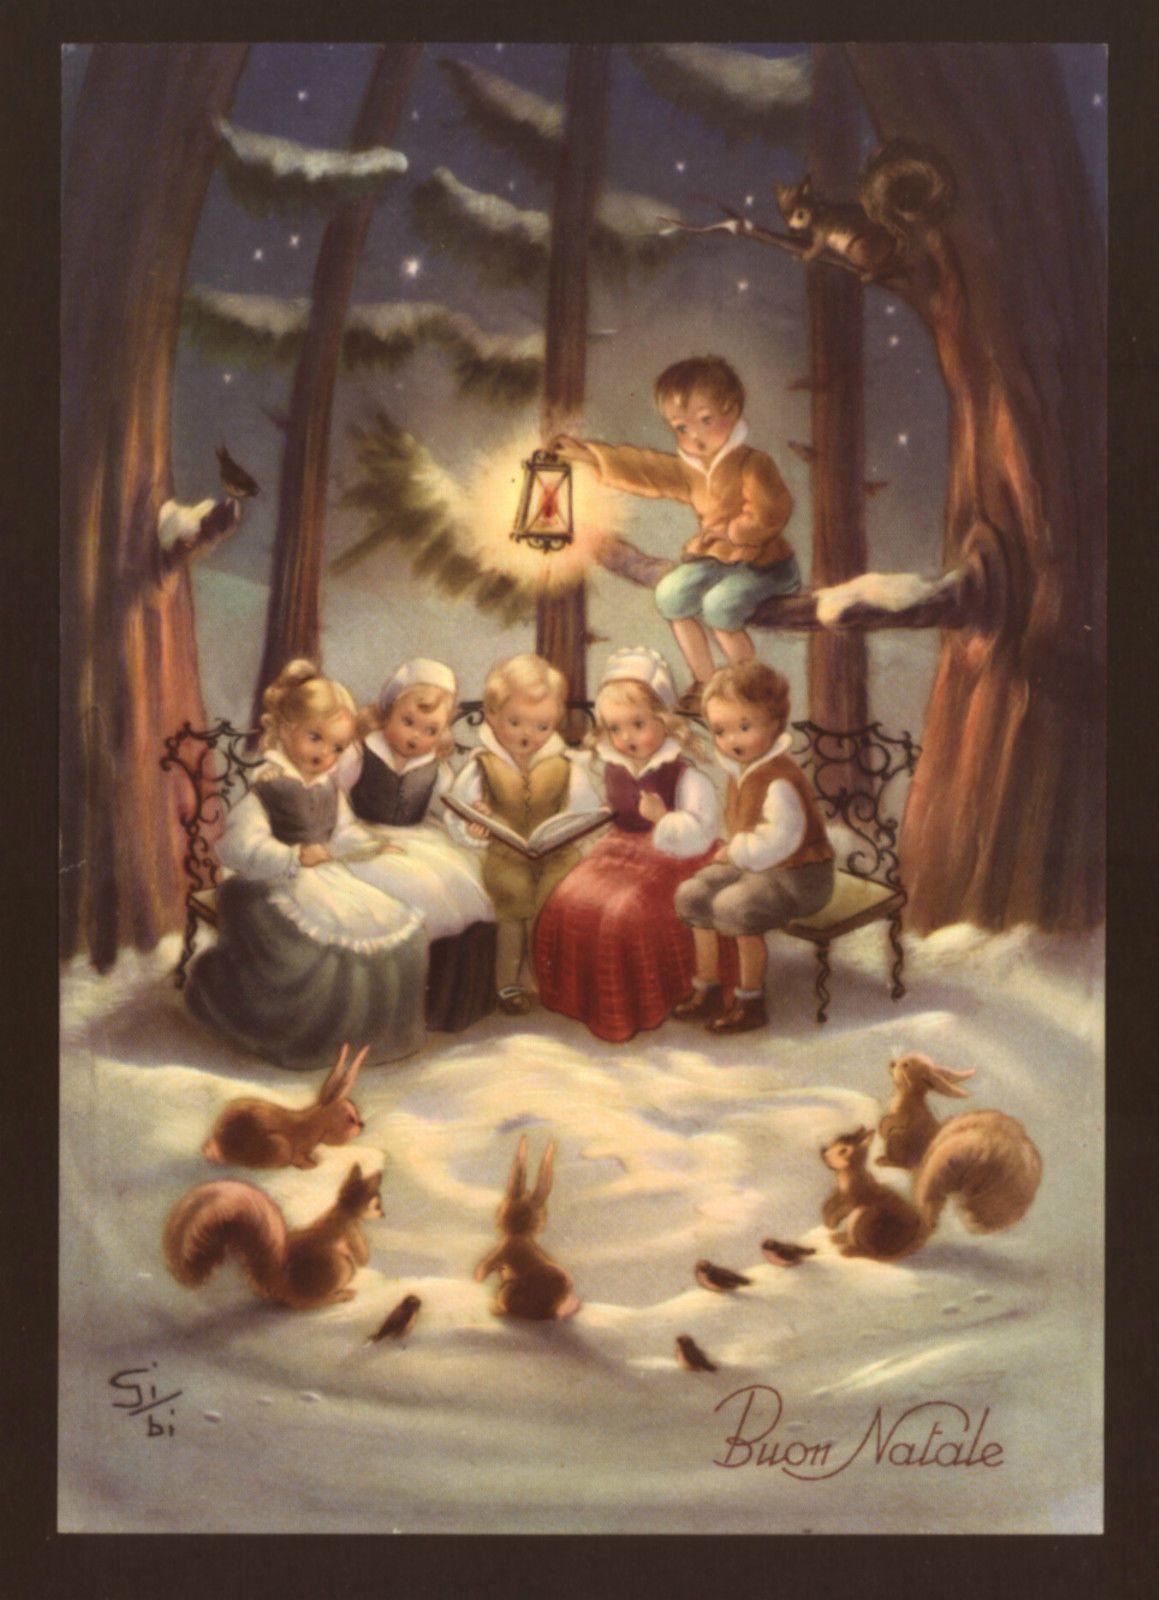 children chorus singing christmas songs for animals in snowy woods sibi postcard ebay - Animals Singing Christmas Songs